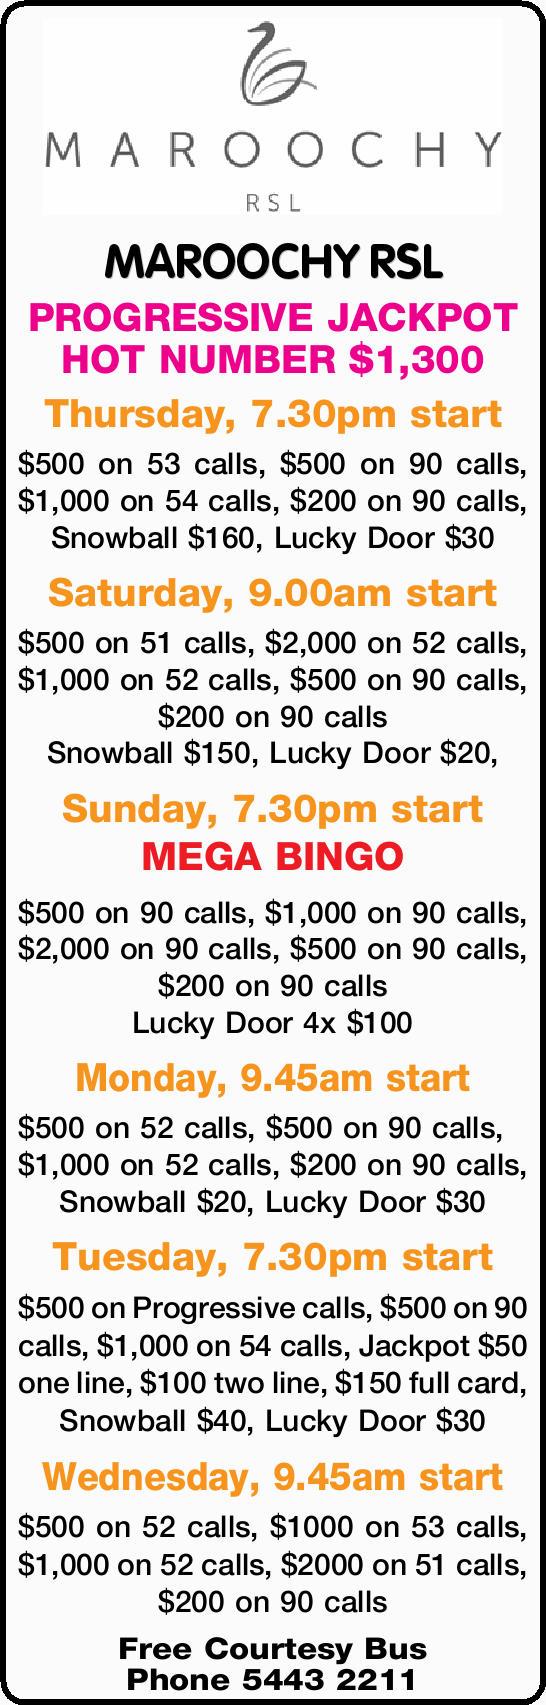 MAROOCHY RSL PROGRESSIVE JACKPOT HOT NUMBER $1,300 Thursday, 7.30pm start $500 on 53 calls, $500...